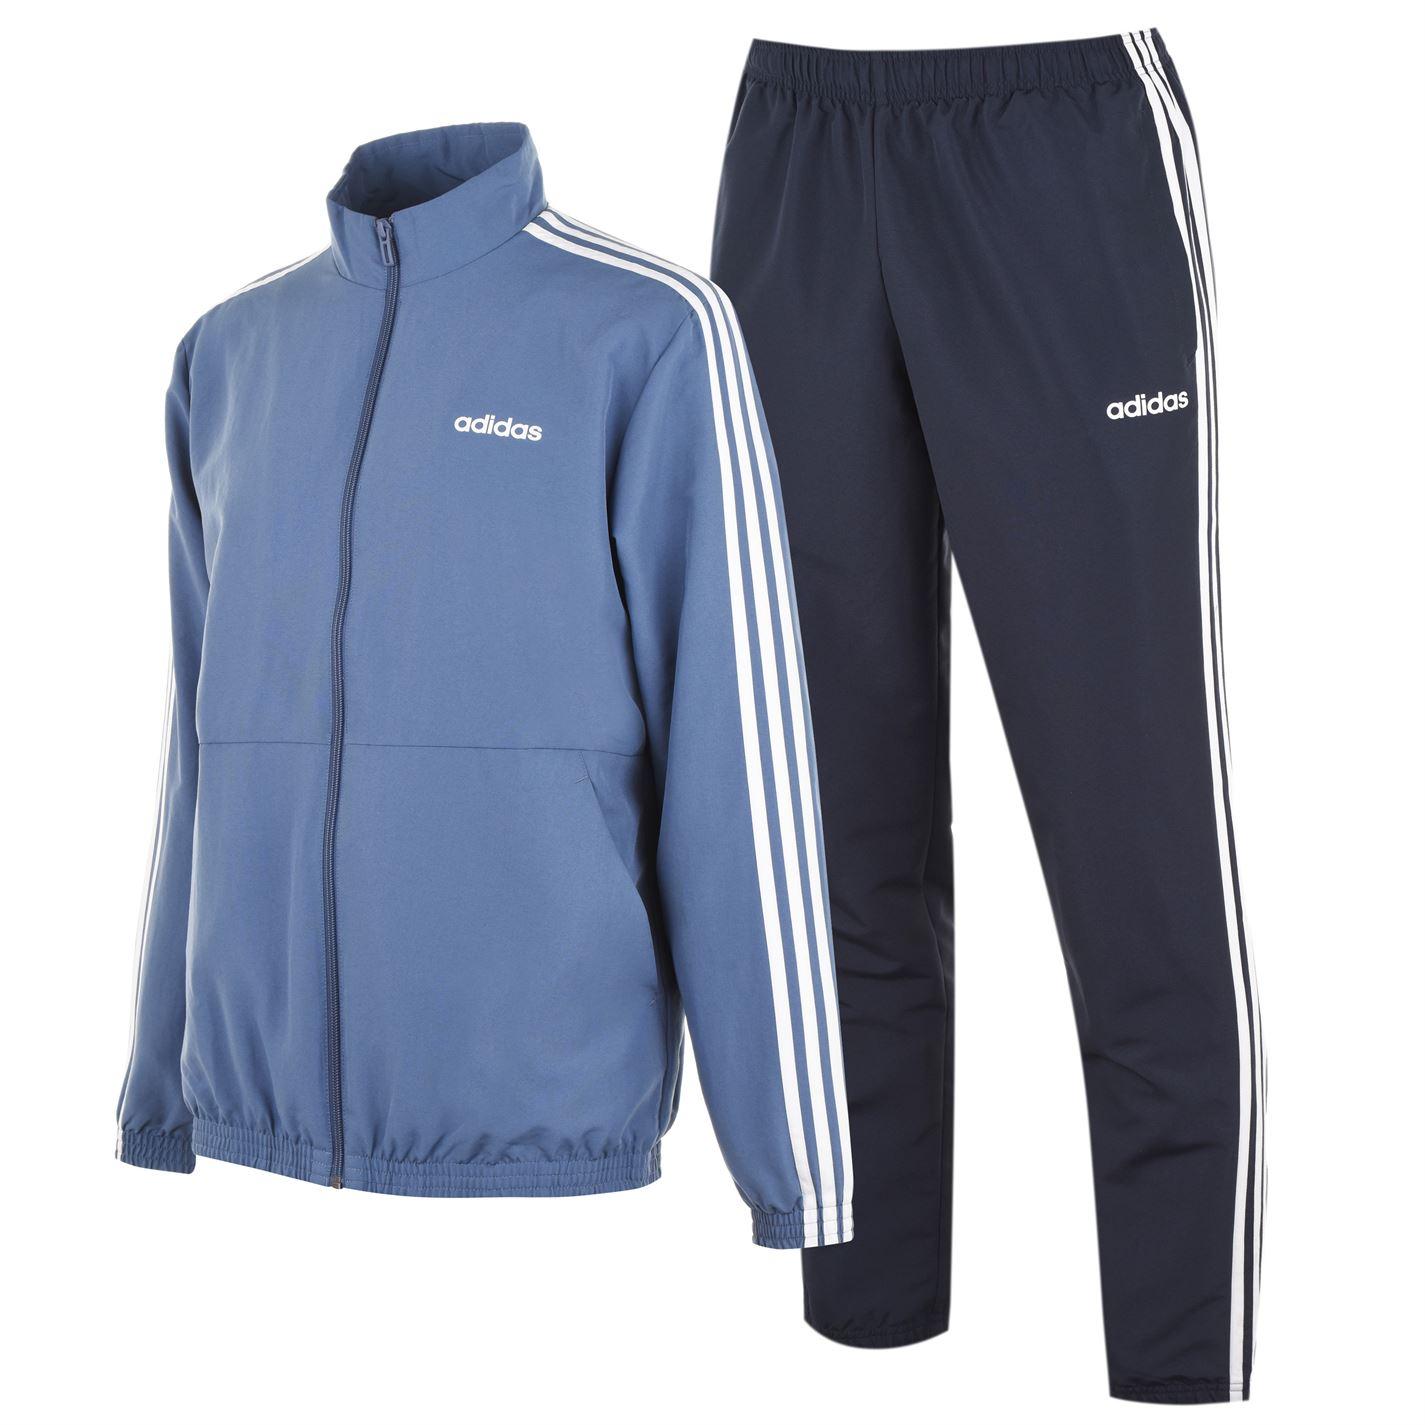 Adidas 3 Stripe Woven Tarcksuit Mens